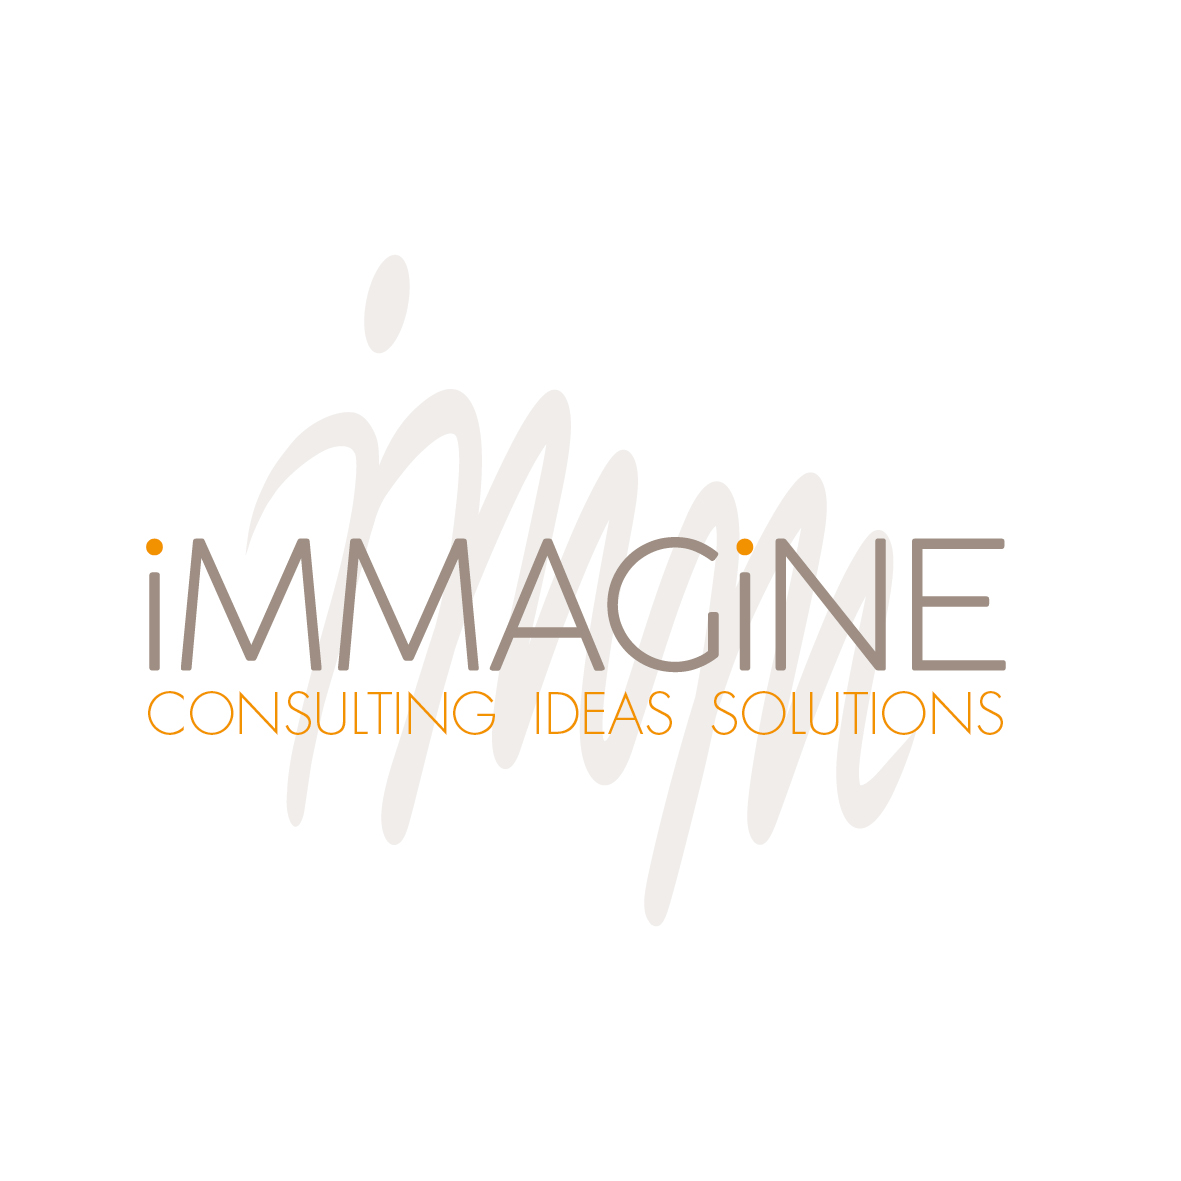 Immagine.one